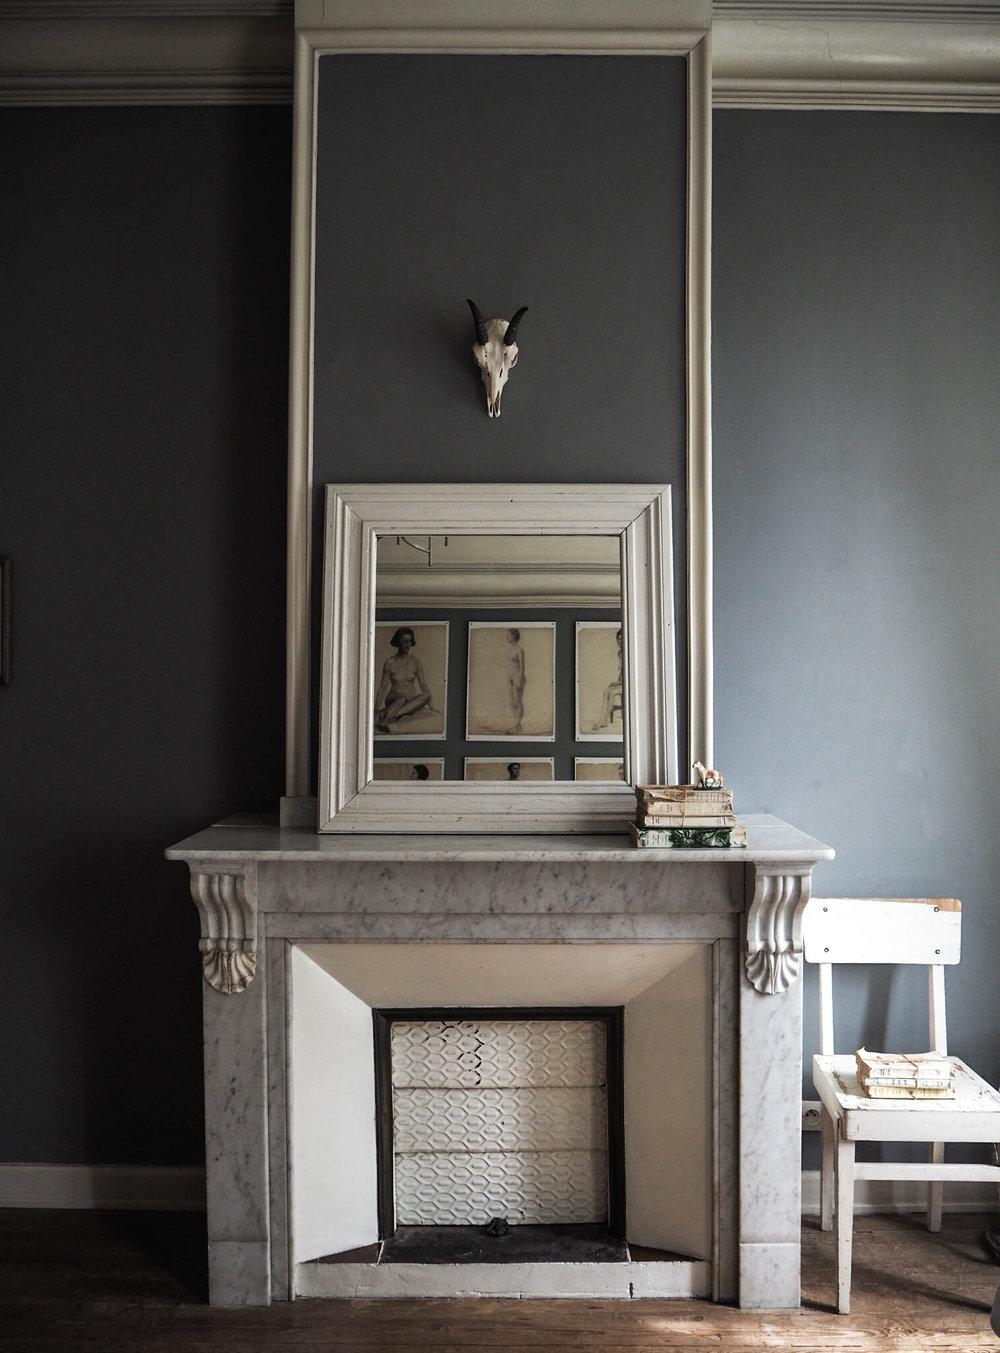 camellas-lloret-maison-d'hotes-room-4-fireplace.jpg